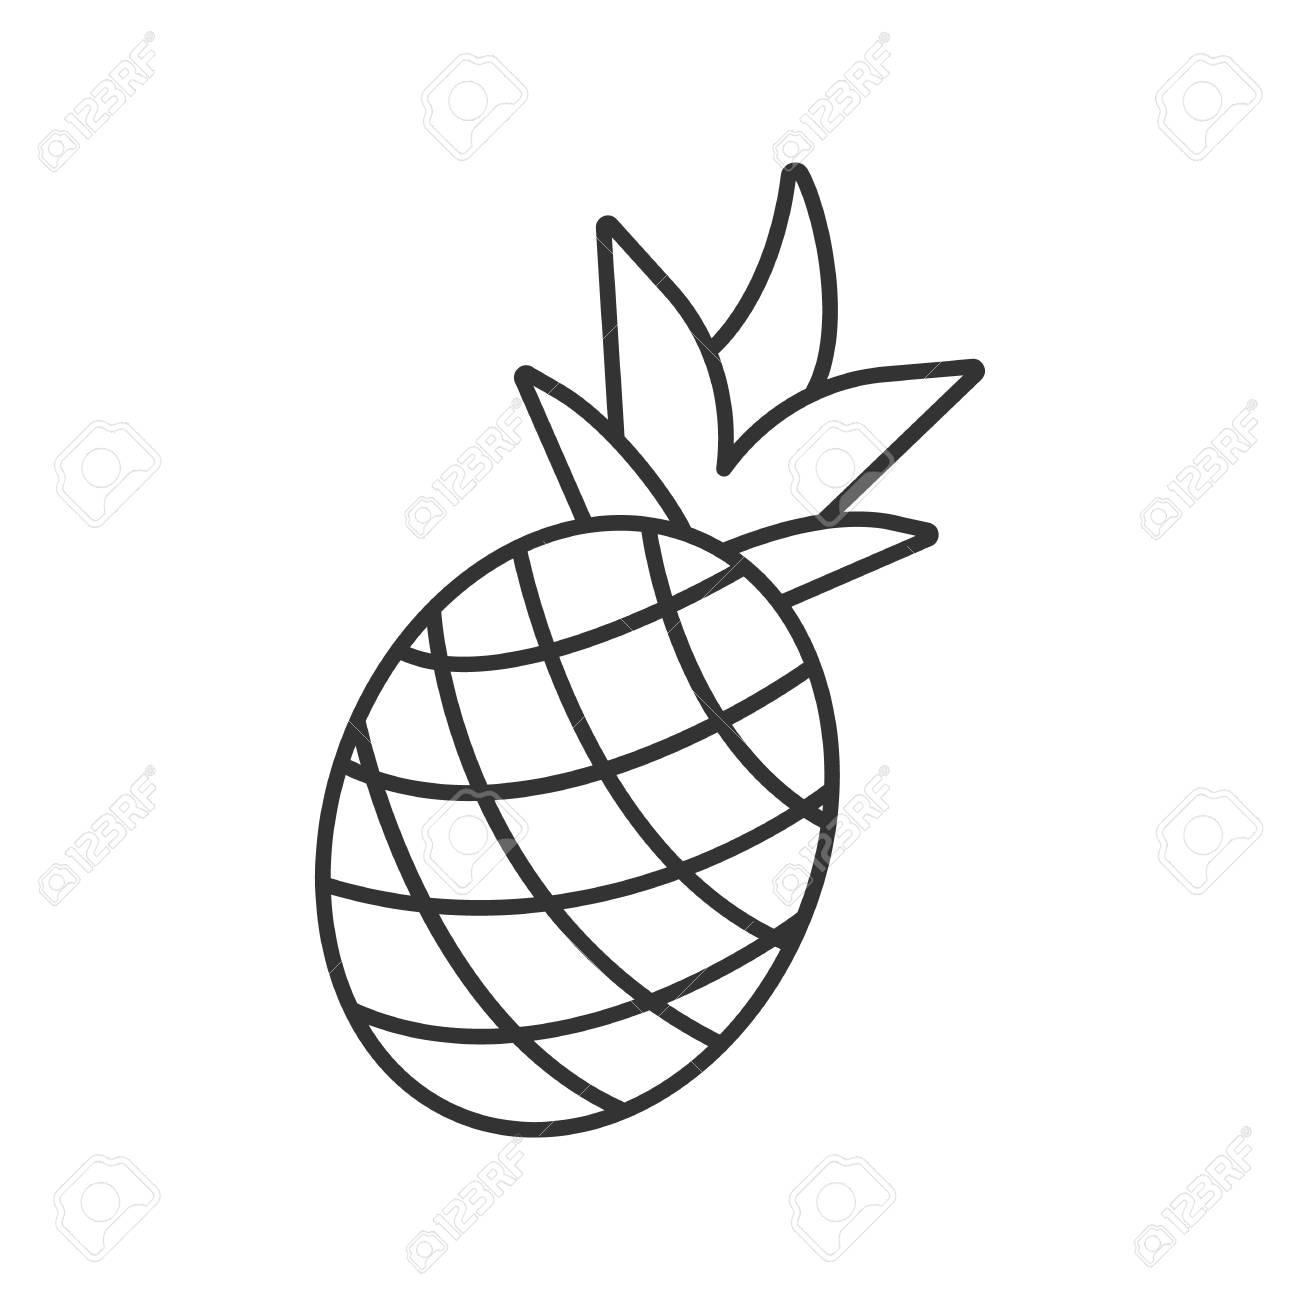 Pineapple Linear Icon Thin Line Illustration Ananas Contour